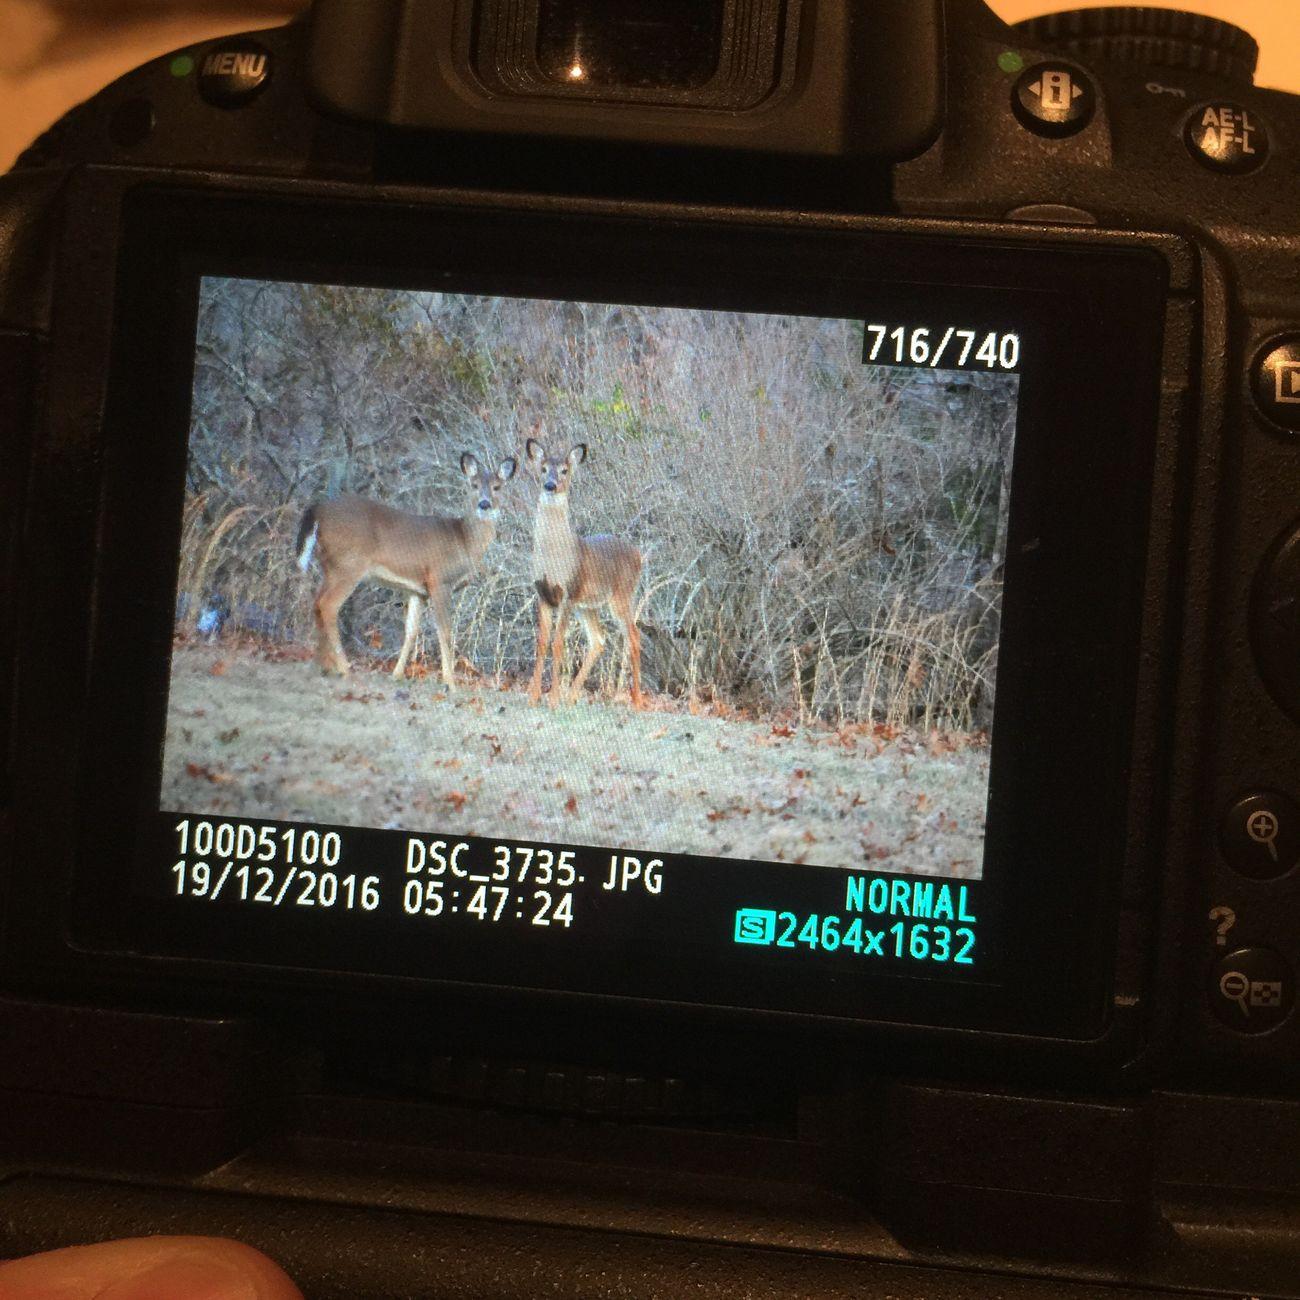 Backyard photos Deer Backyardphotography Animals In The Wild Deers Nature Beauty Peace Nikonphotography Nikon